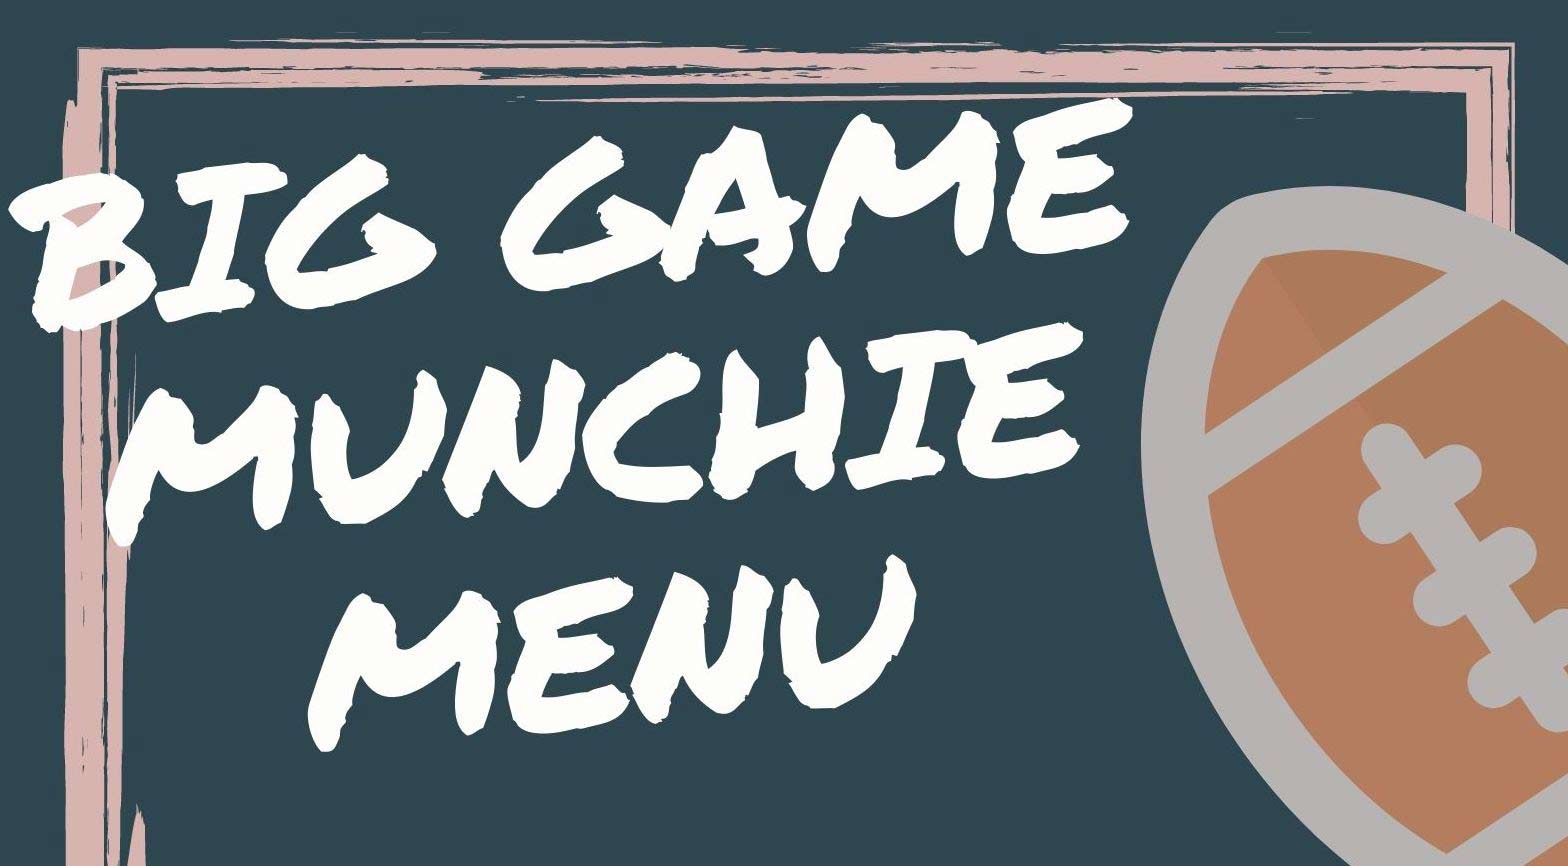 Photo credit: Match Market & Bar Big Game Munchie Menu